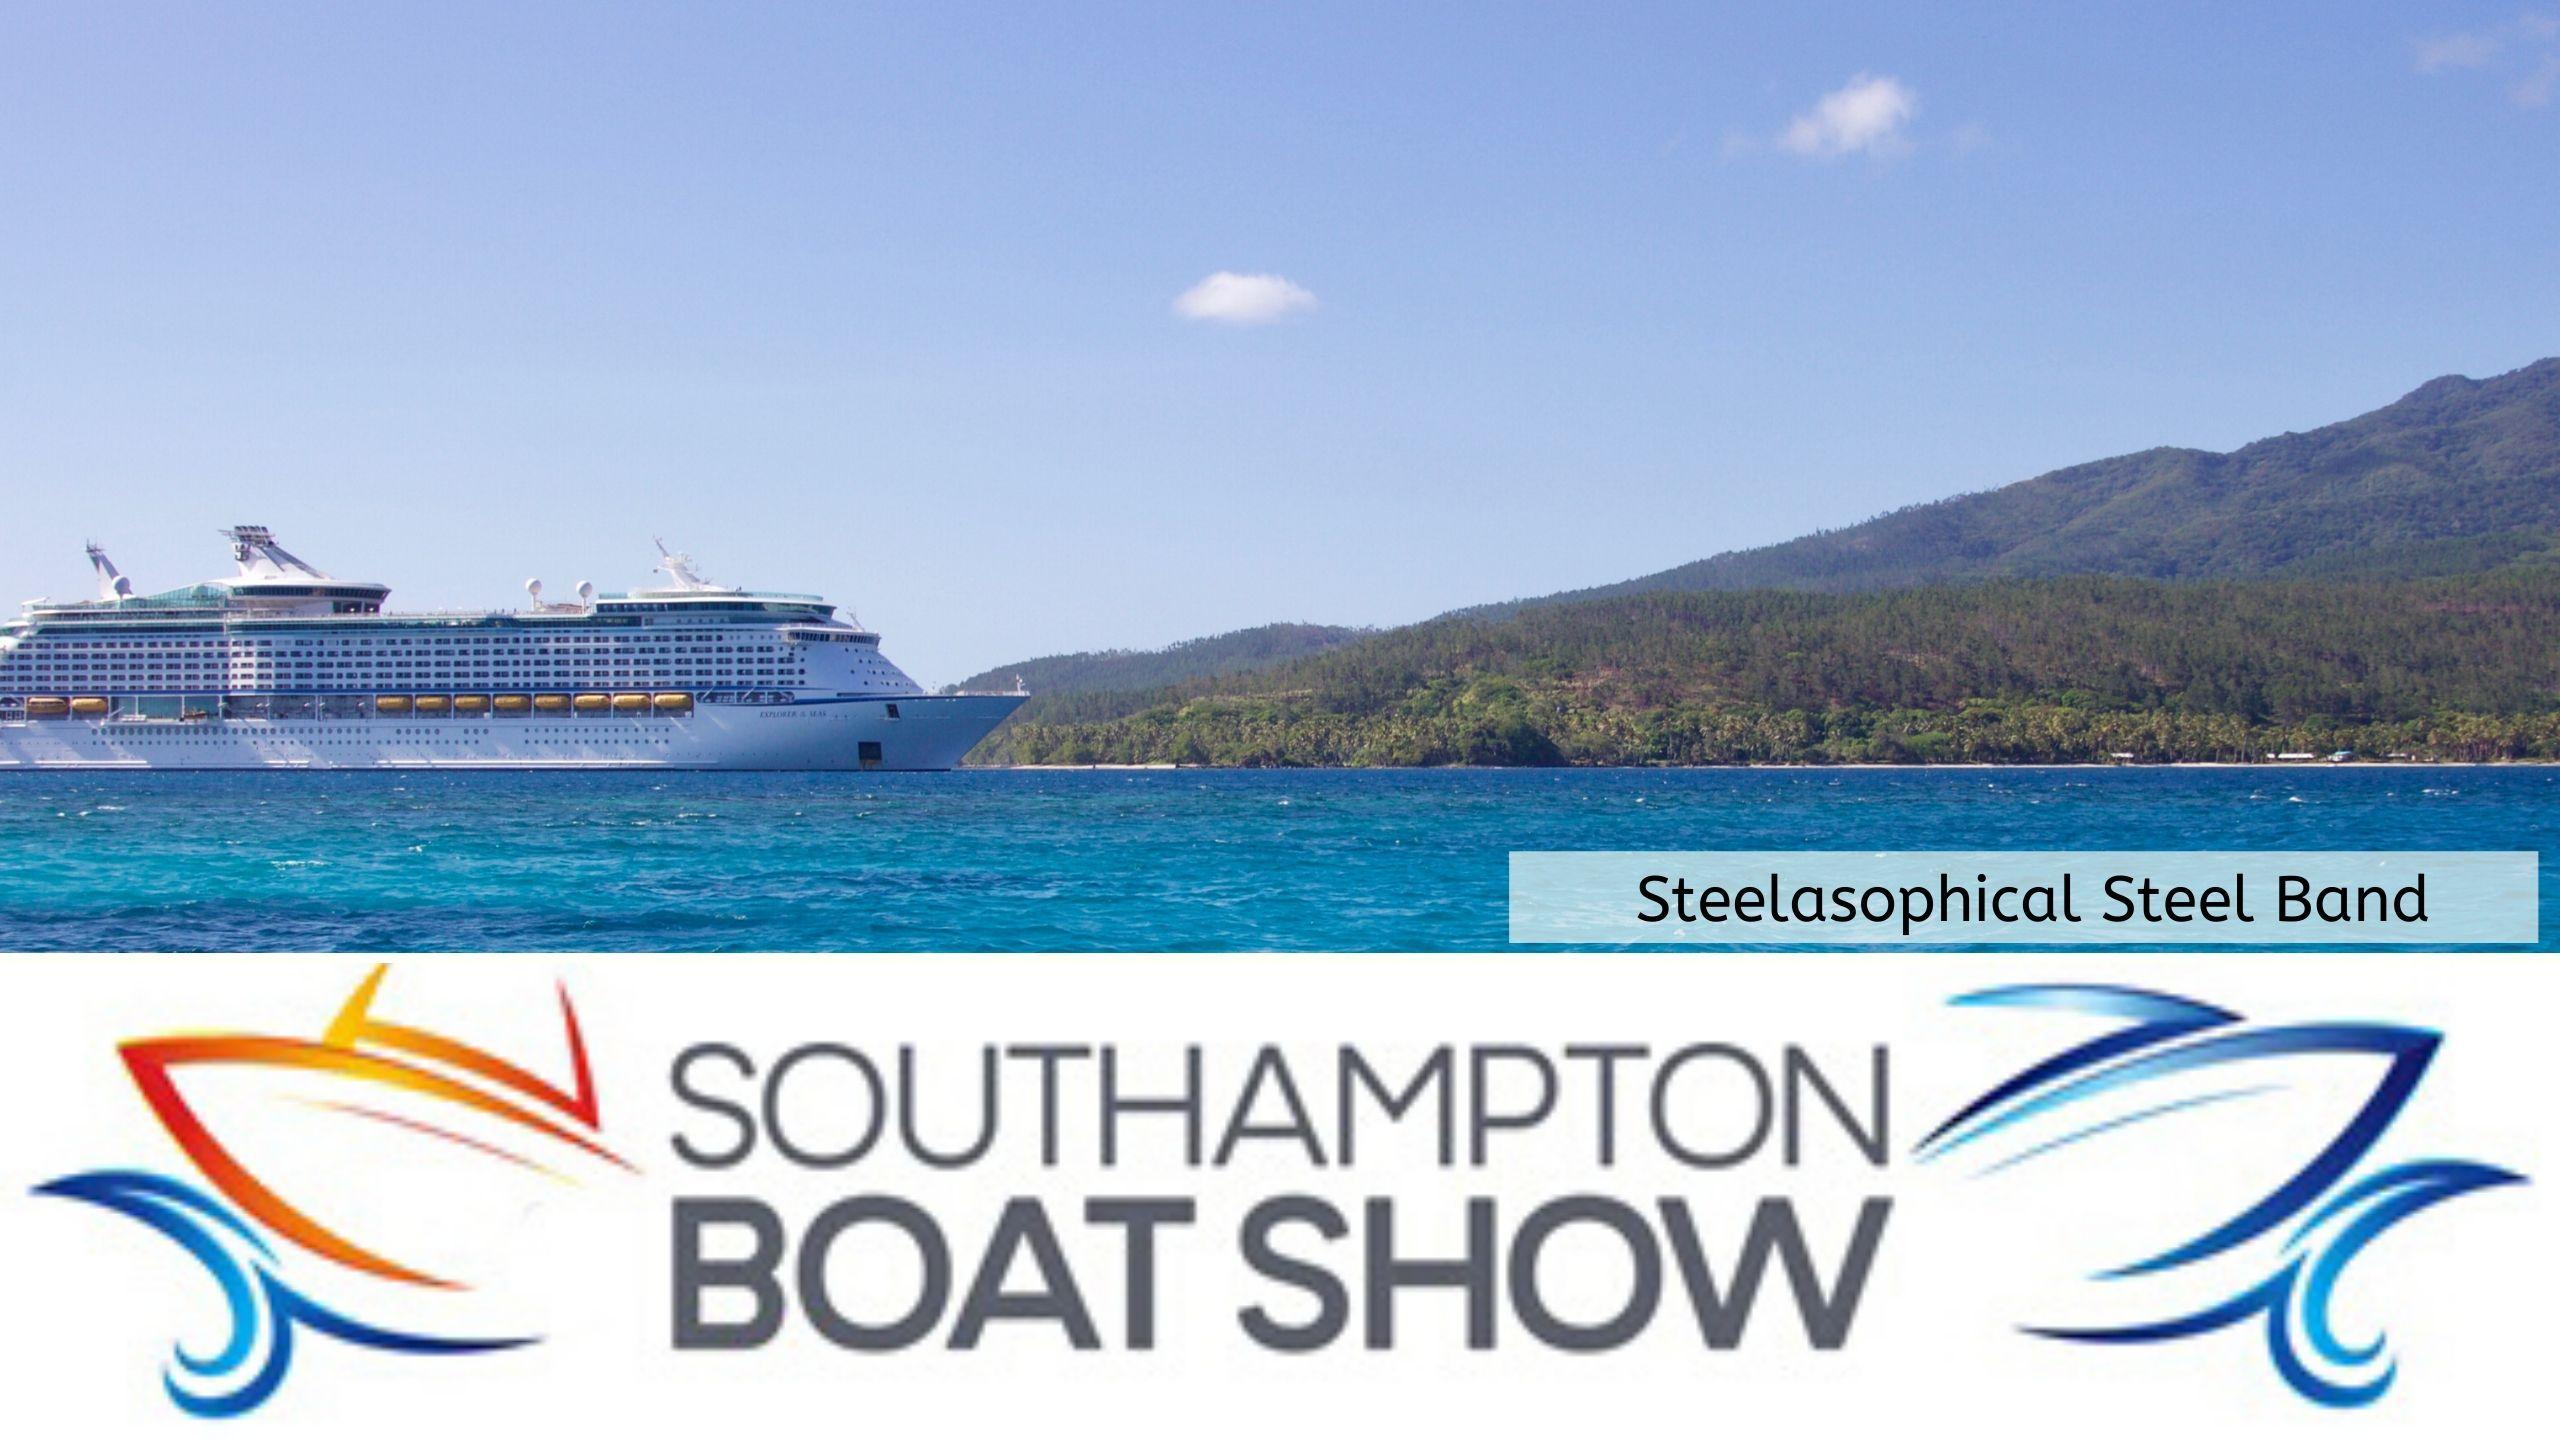 Steelasophical Steel Band Southampton Boat Show Yacht Market 8585